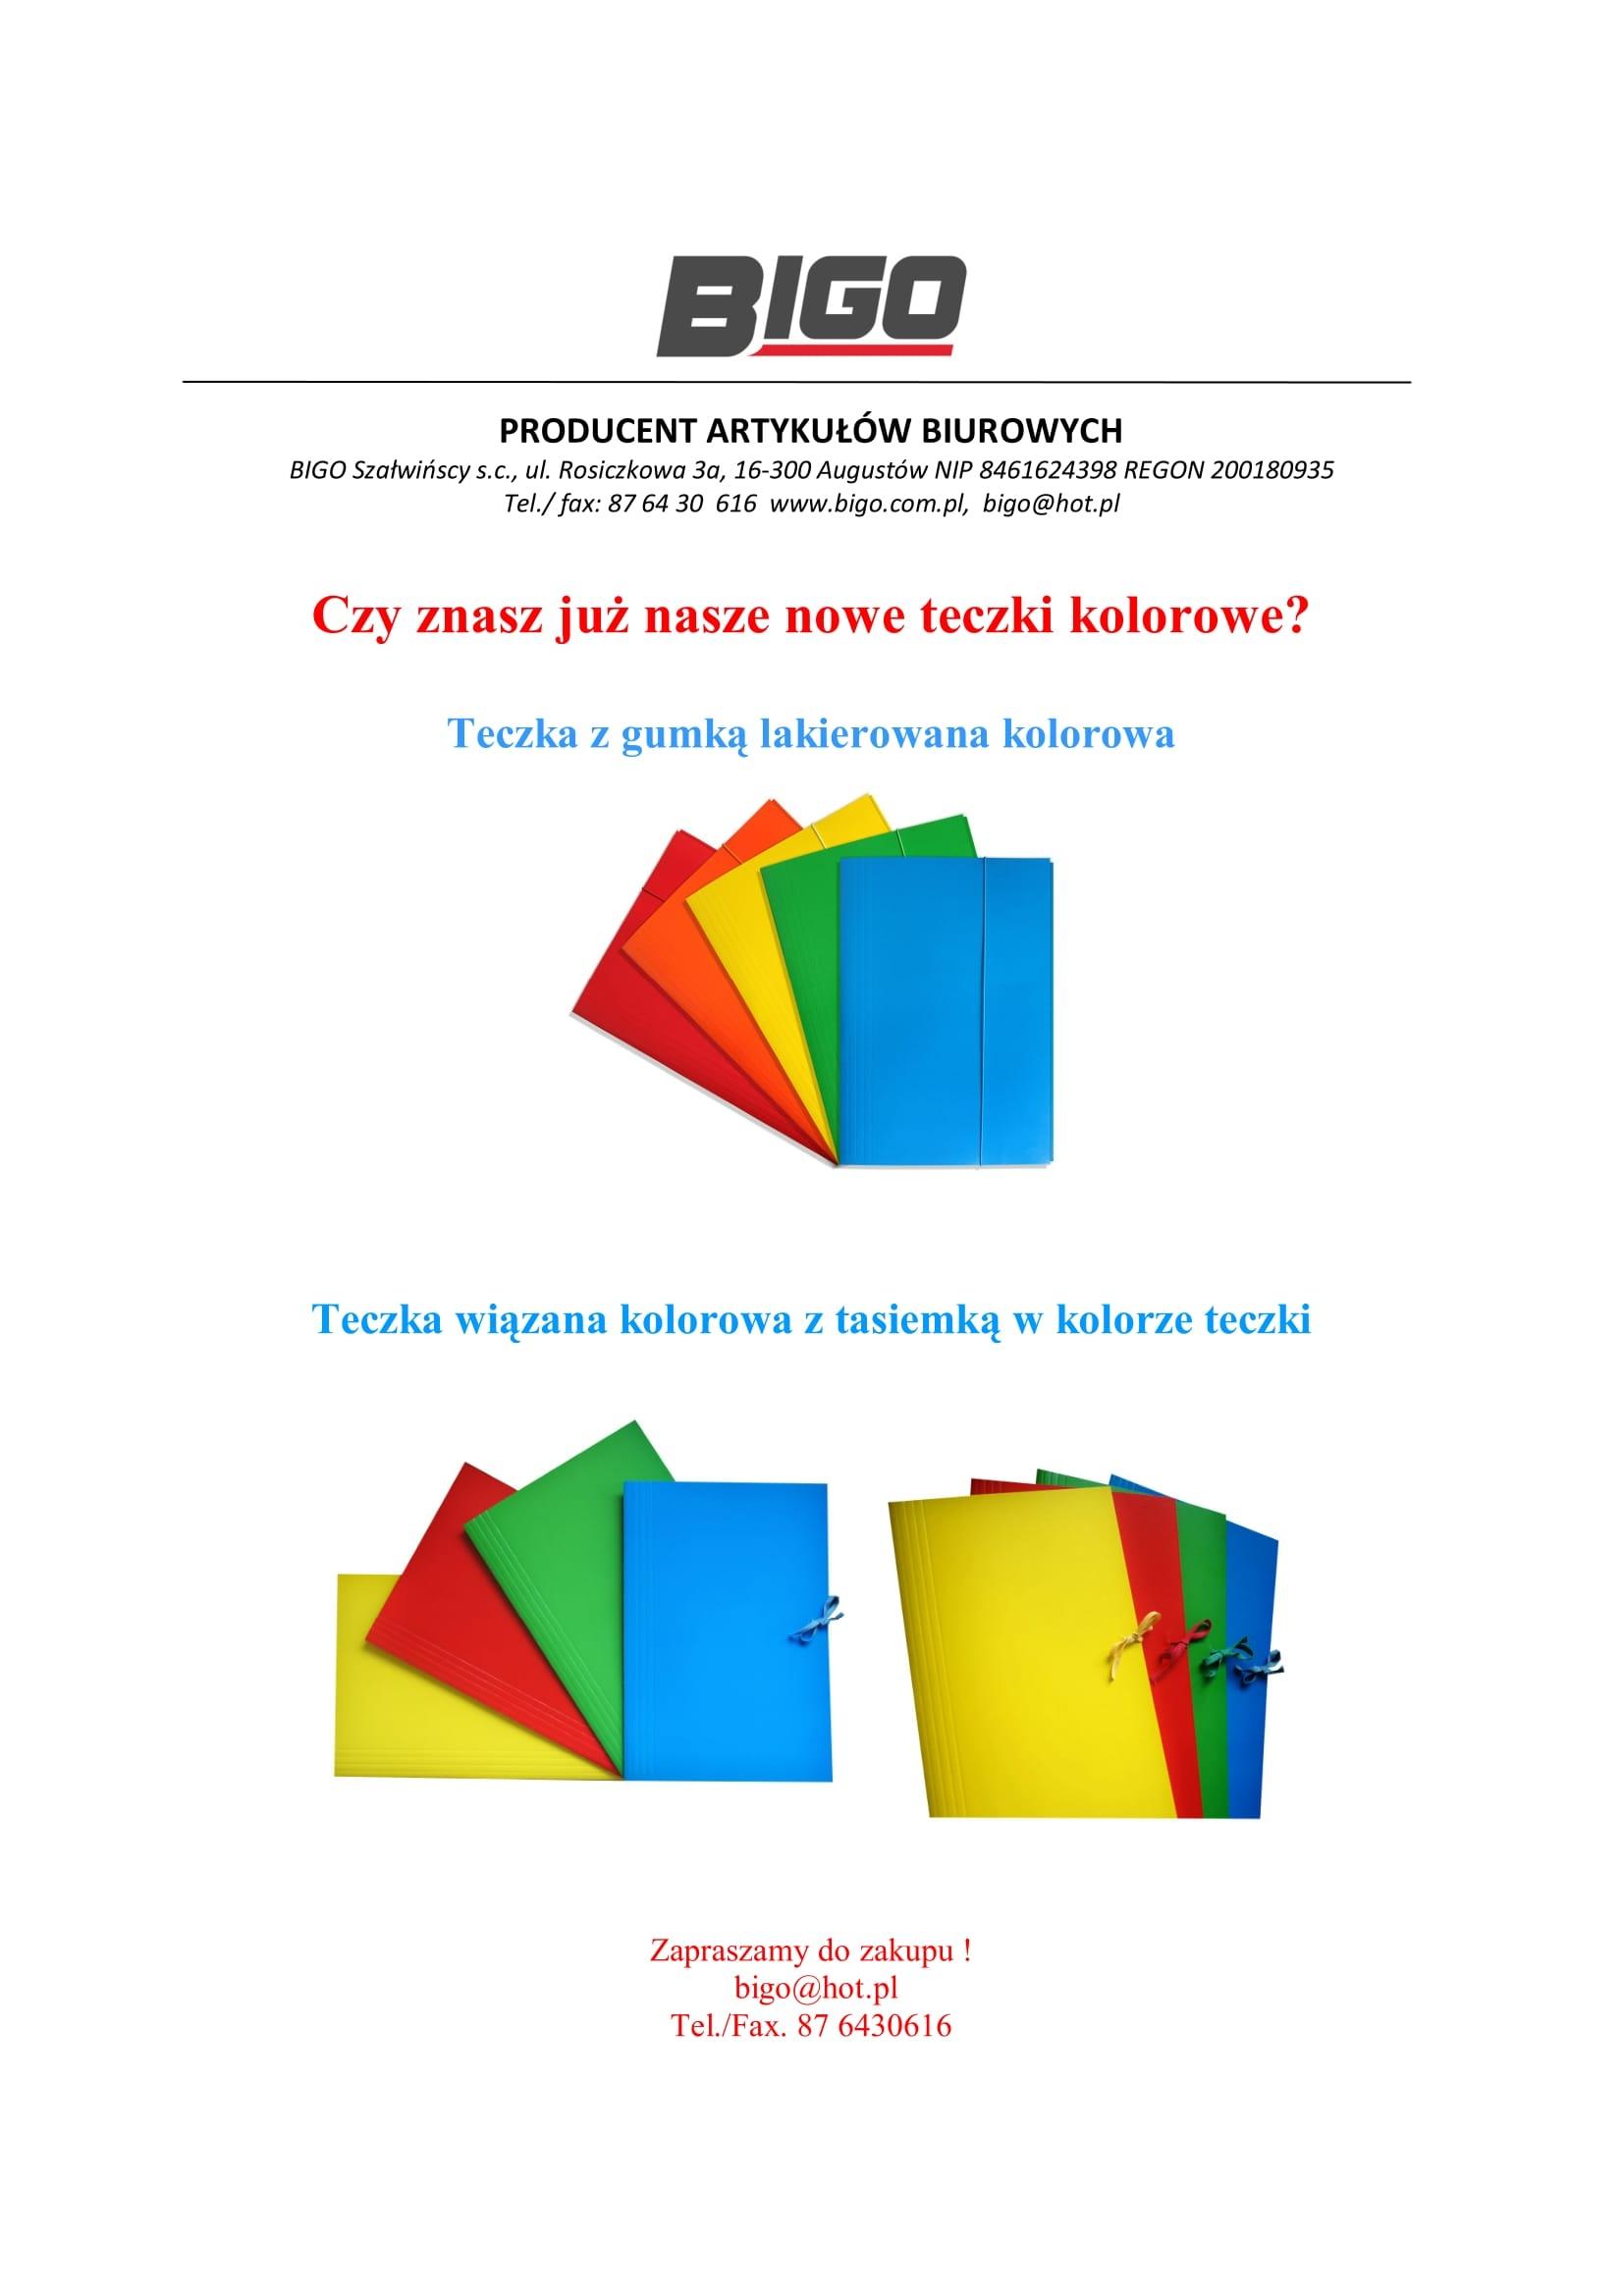 bigo oferta teczki kolorowe-1